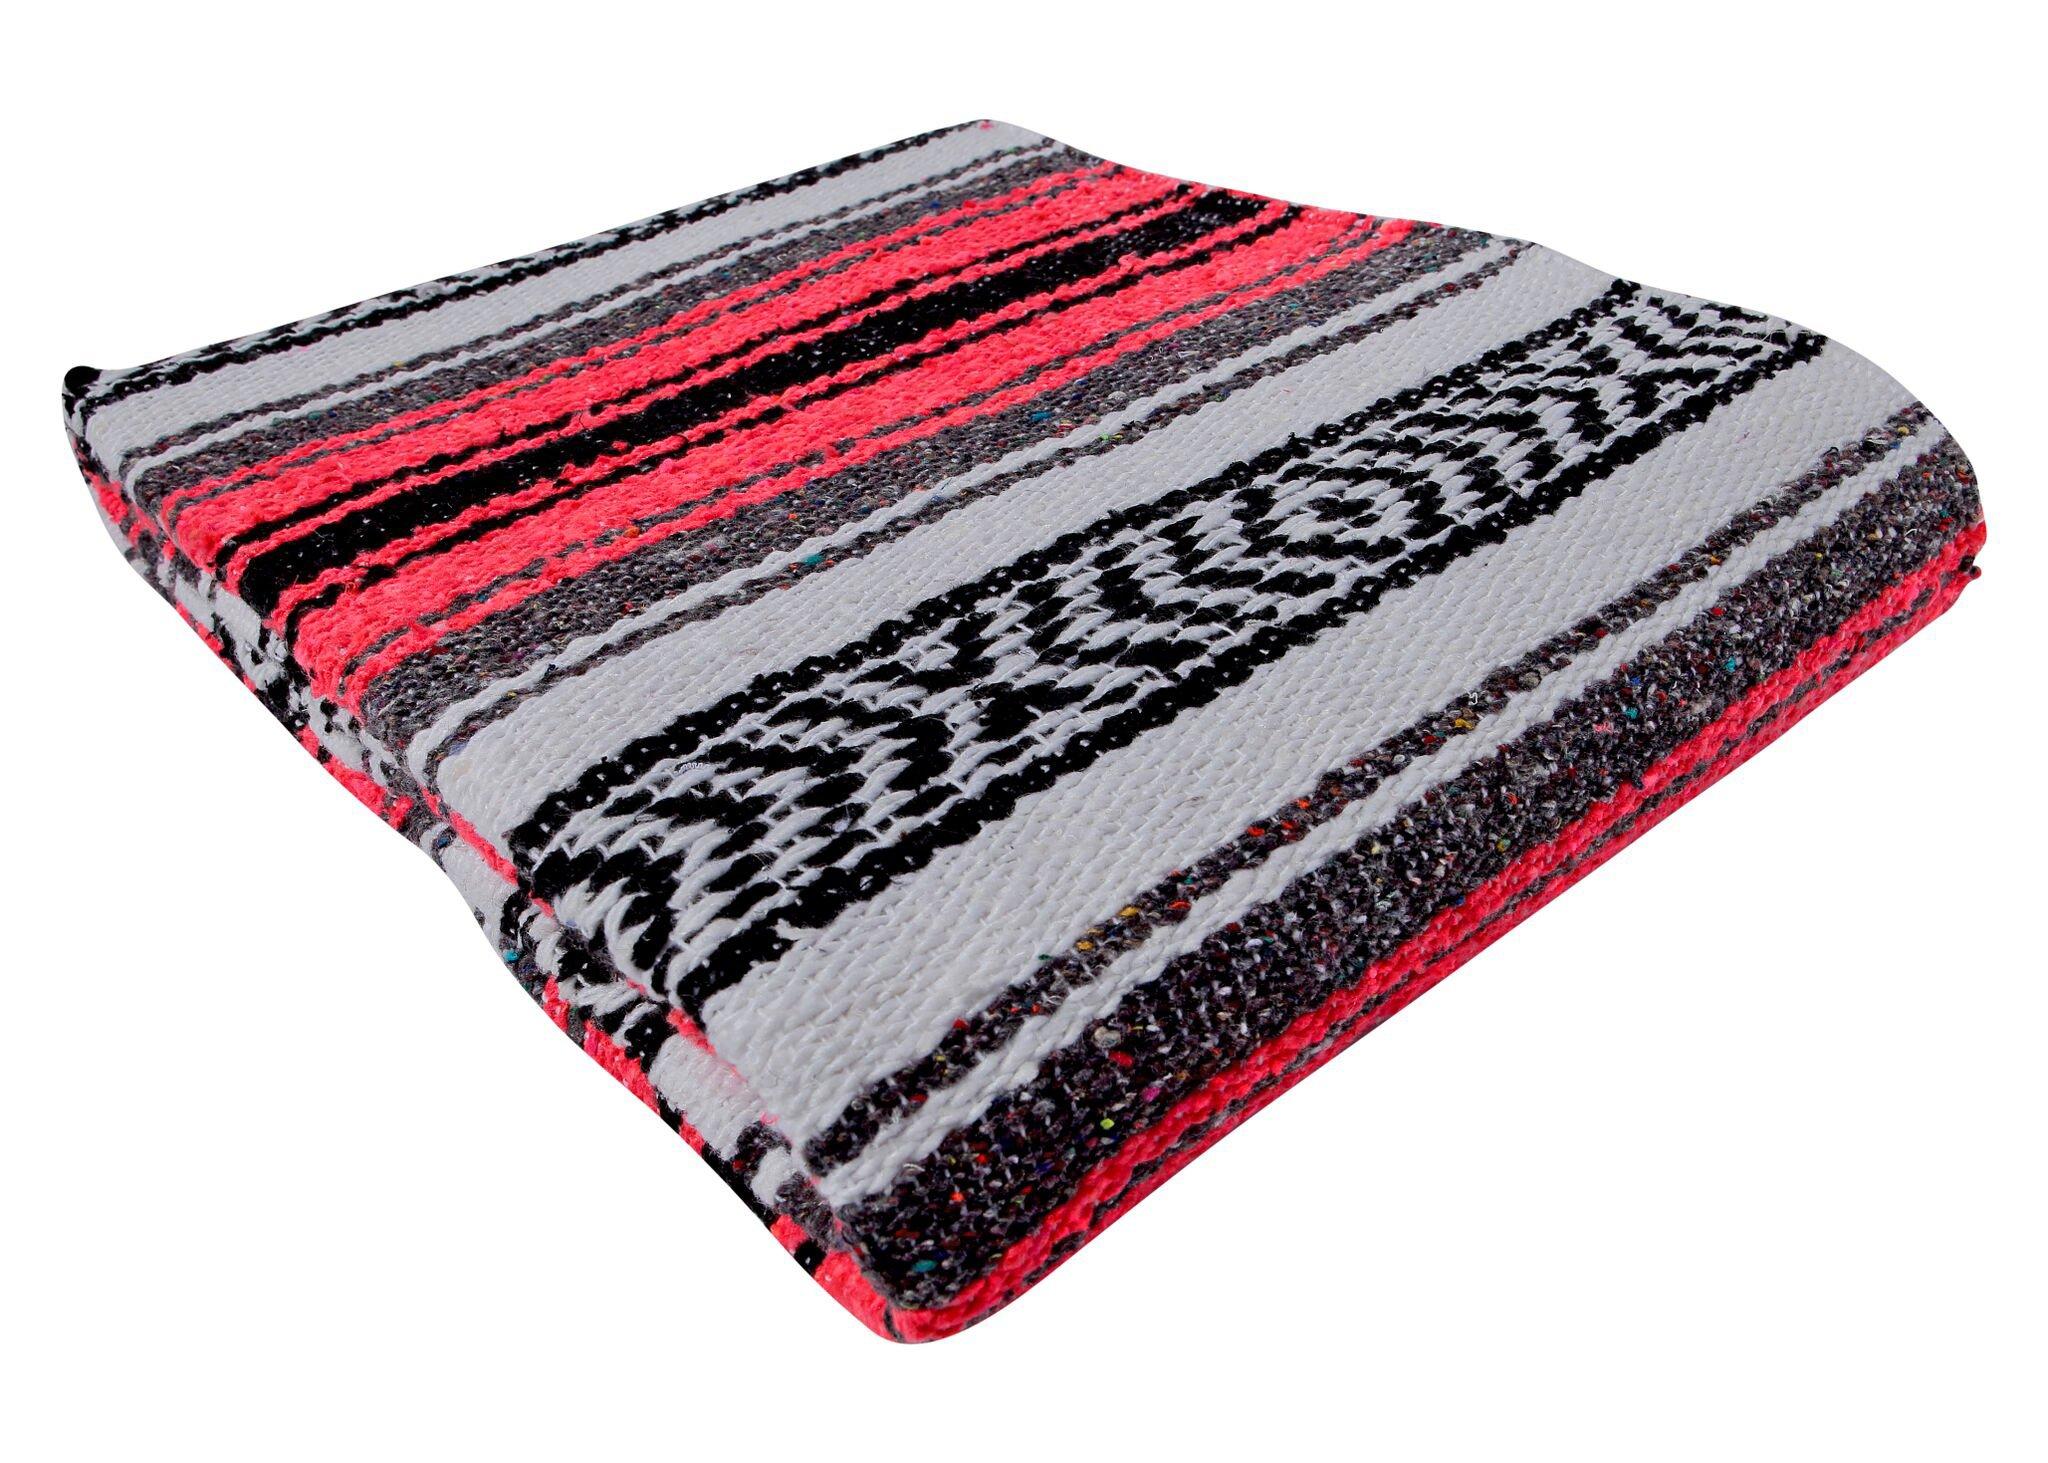 El Paso Designs Genuine Mexican Falsa Blanket - Yoga Studio Blanket, Colorful, Soft Woven Serape Imported from Mexico (Bright Coral) by El Paso Designs (Image #5)